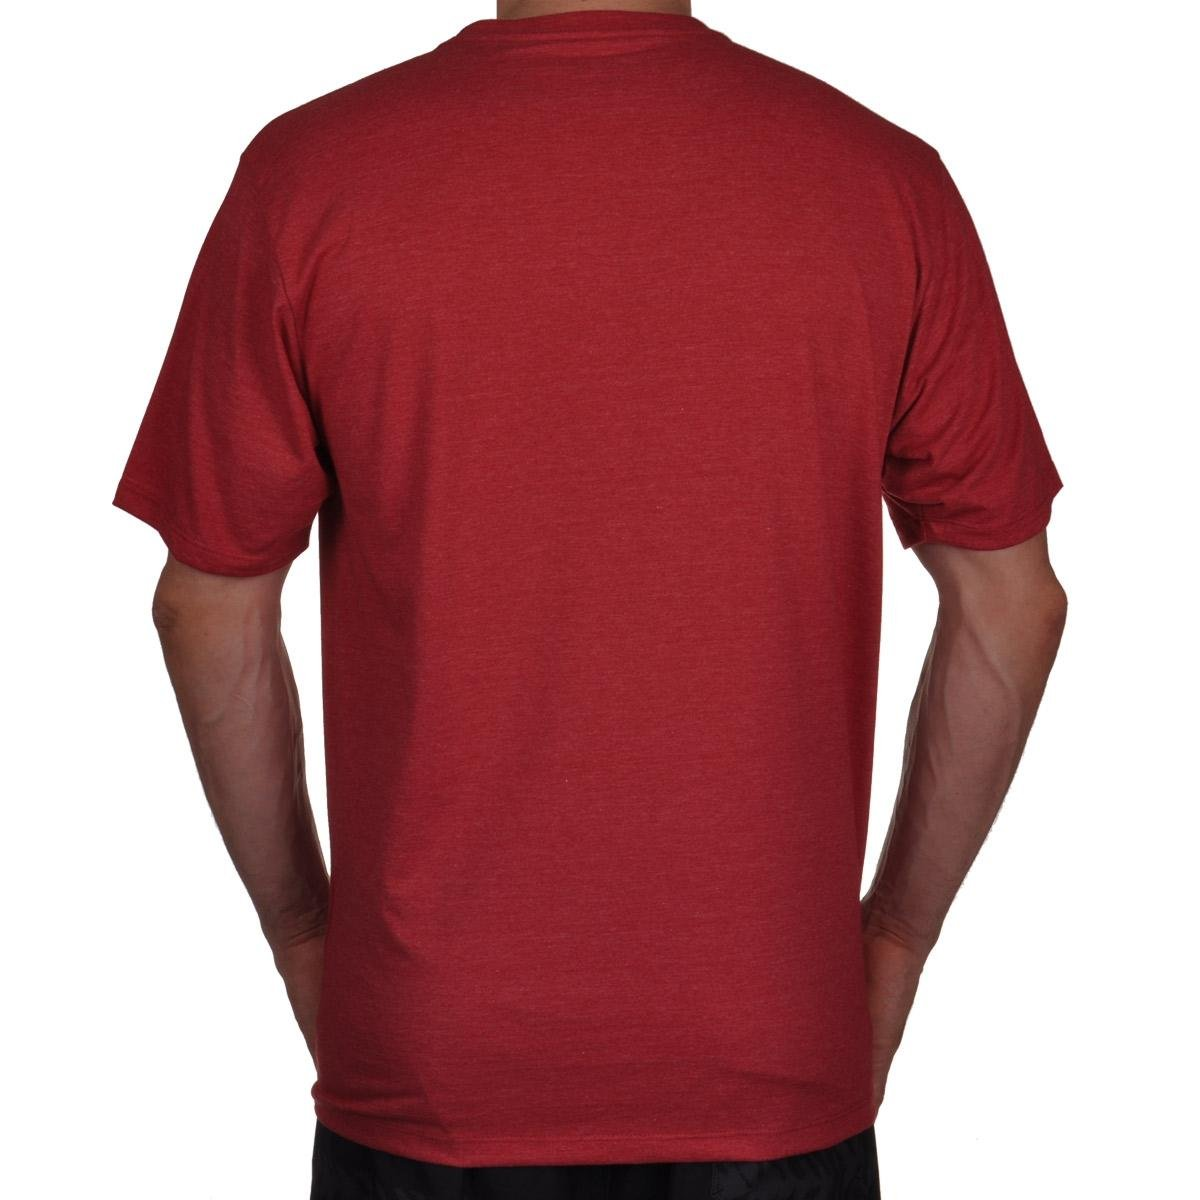 Vermelho Masculino O Silk Camiseta amp;O Hurley Camiseta Hurley ngxqCv0wF